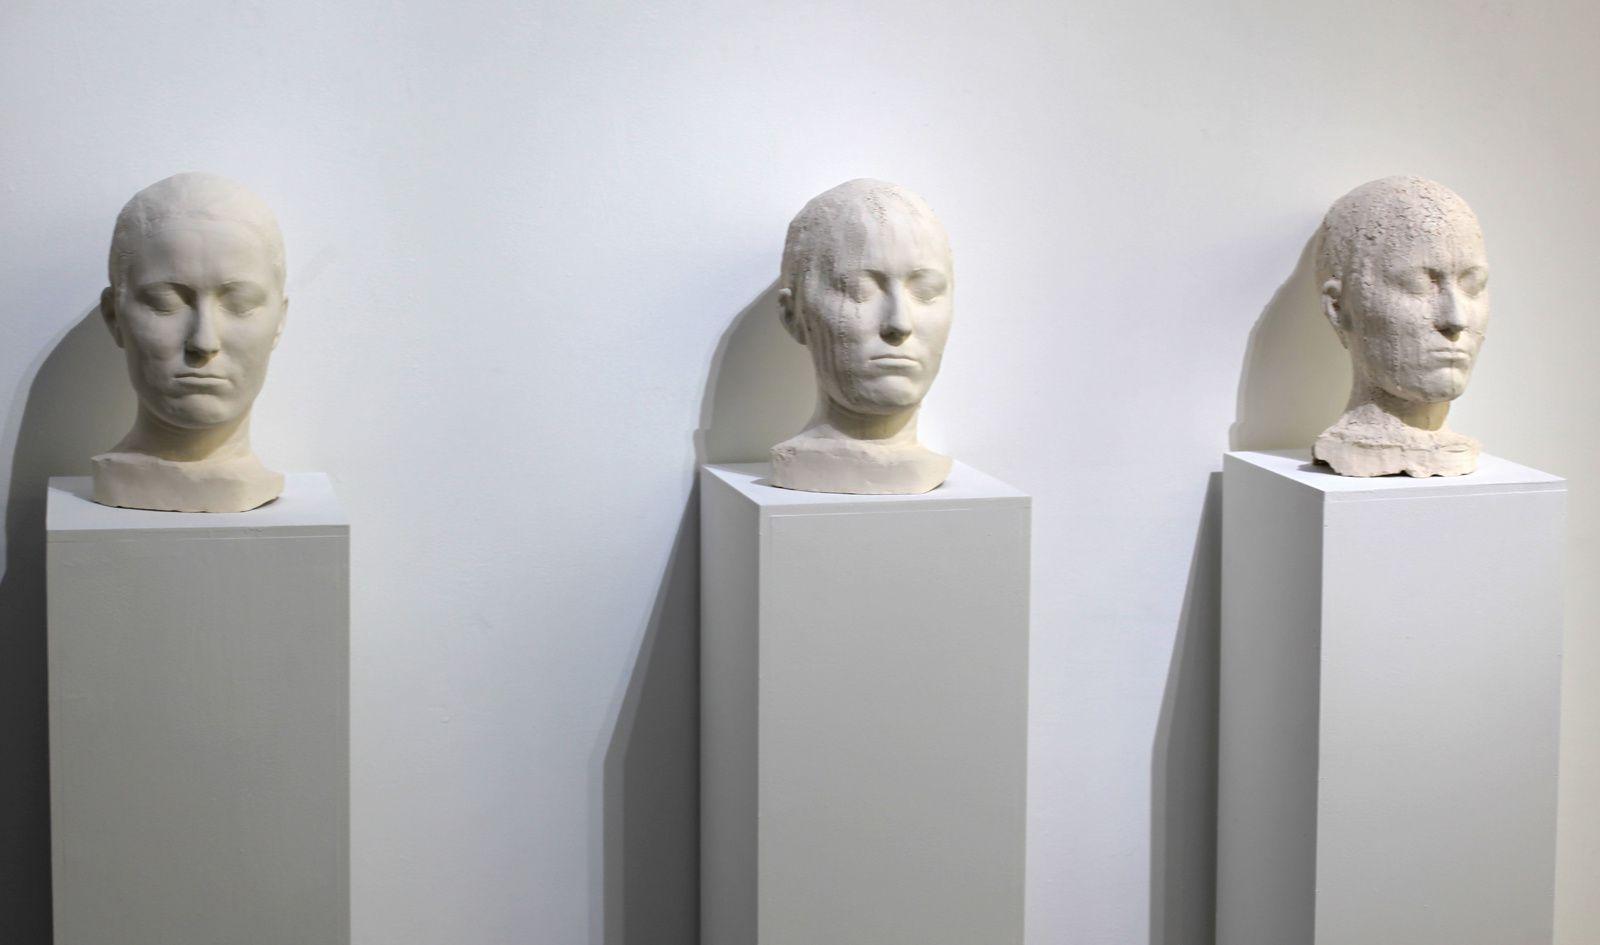 """Corrosion I, II, III (Aequivocus)"", 2015 de François CHAILLOU. Galerie Particulière © Photo Éric Simon"